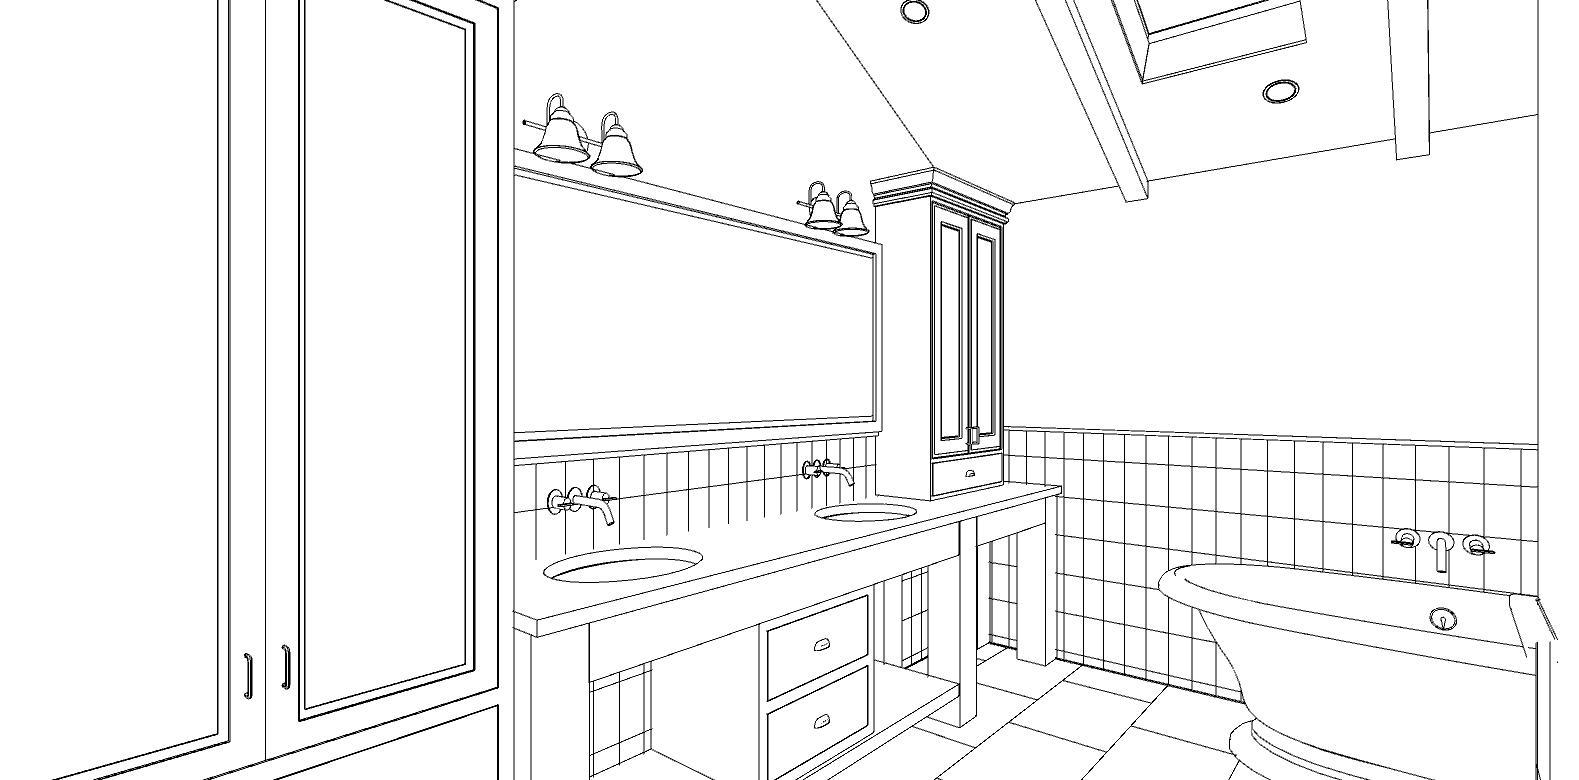 Kitchen bath design challenges 2d to 3d for Bathroom design 2d